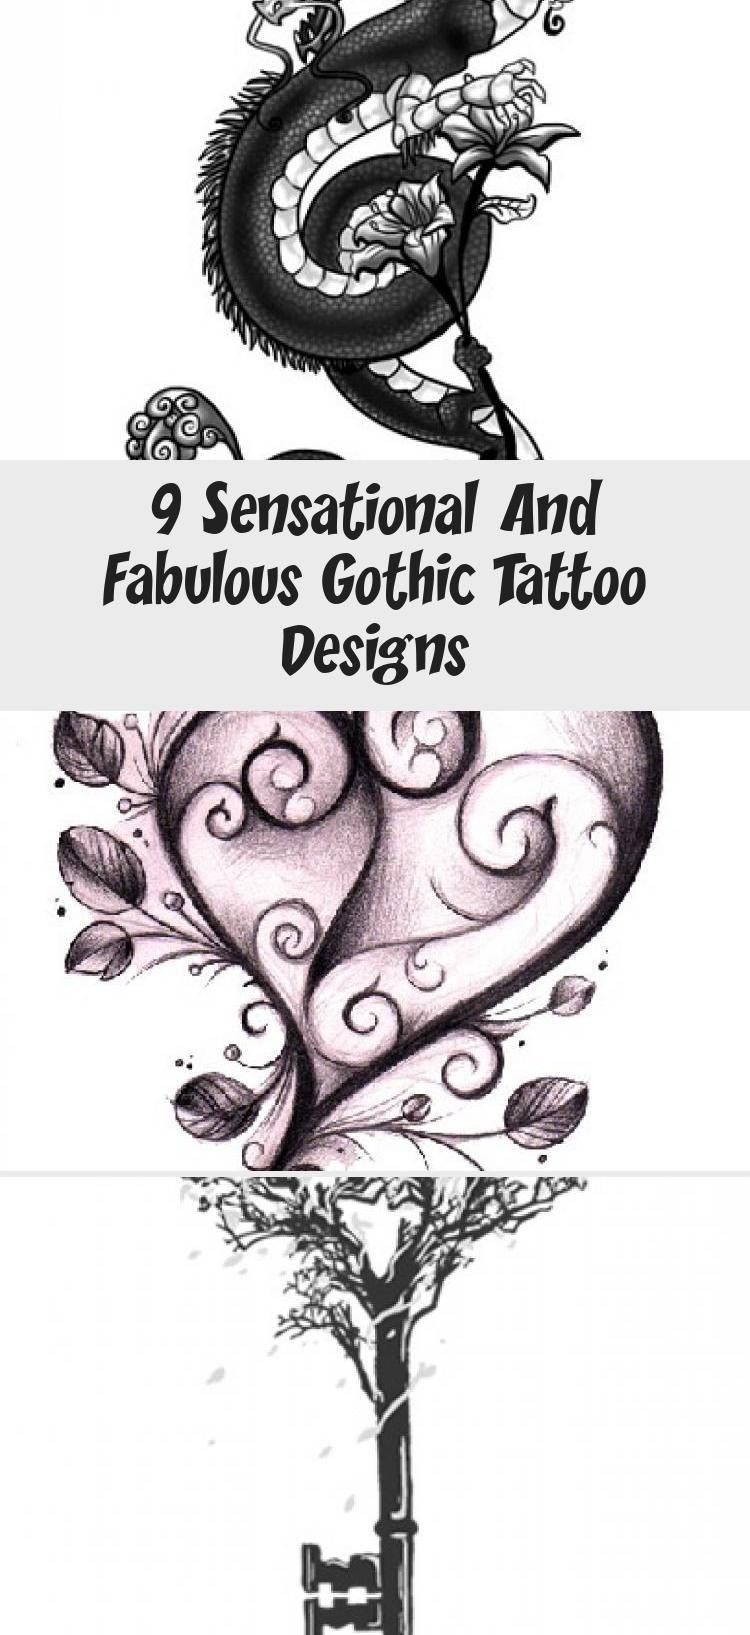 Gothic Heart Tattoo : gothic, heart, tattoo, Impressive, Gothic, Heart, Tattoo, Design, #Humanhearttattoo, #Pinkhearttattoo, #Blackhearttattoo, #hearttattooF…, Tattoo,, Designs,, Horse